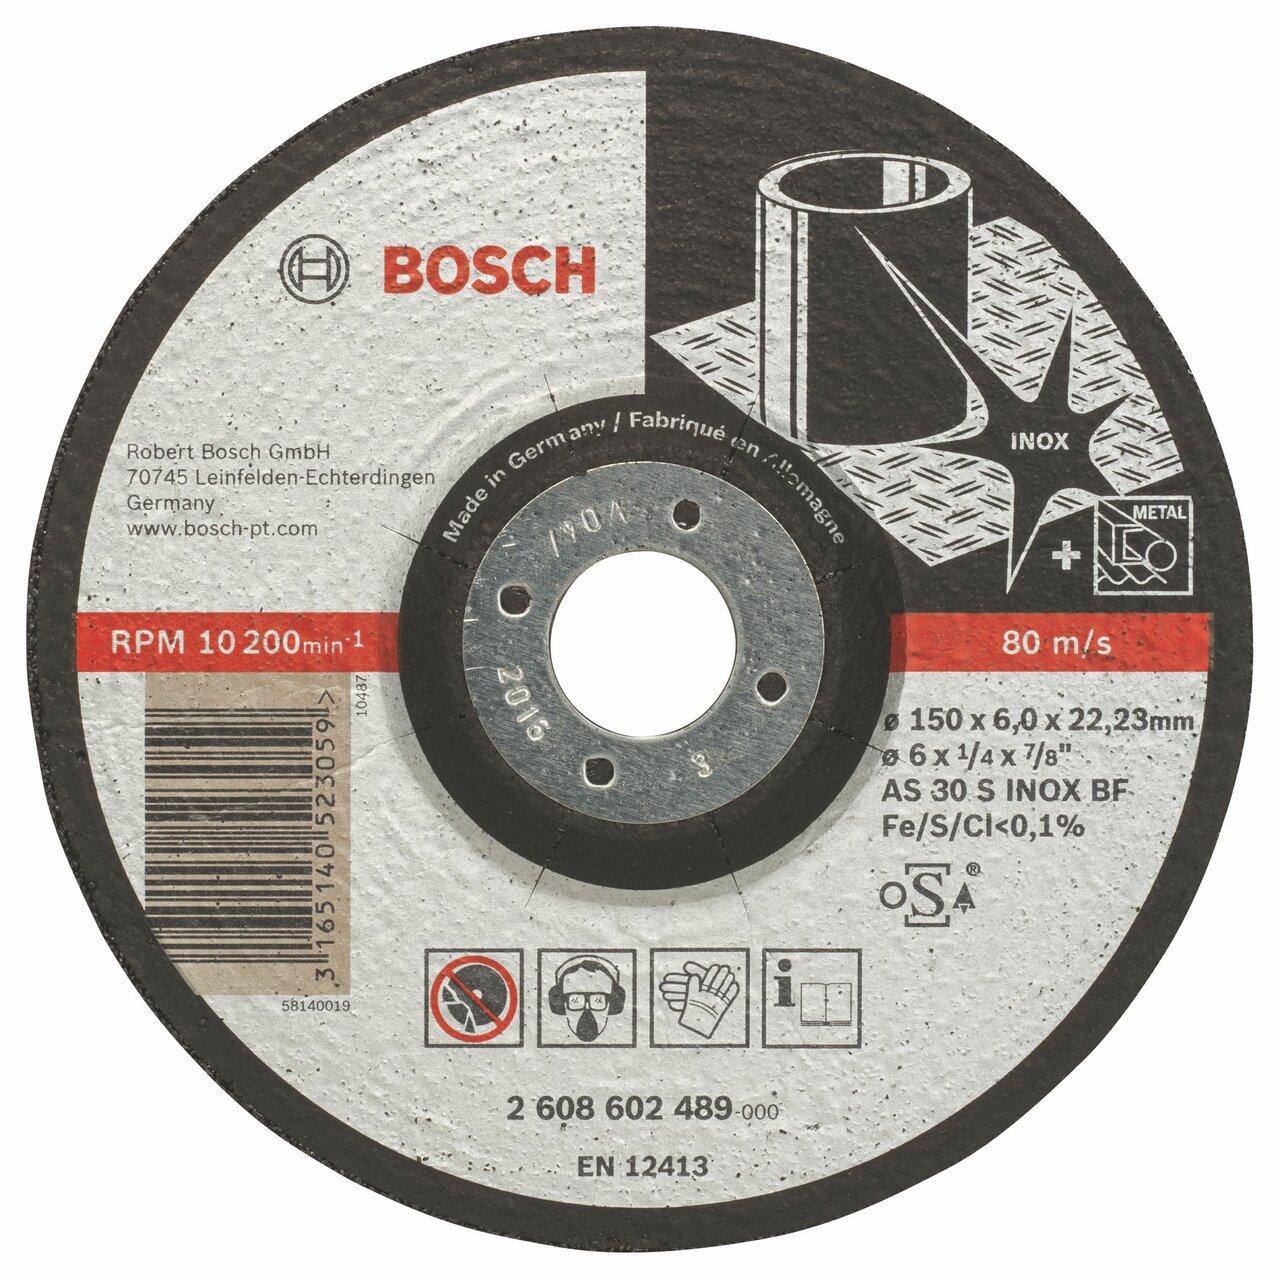 Bosch 2608602489 150MM Stainless Steel INOX Grinding DISC